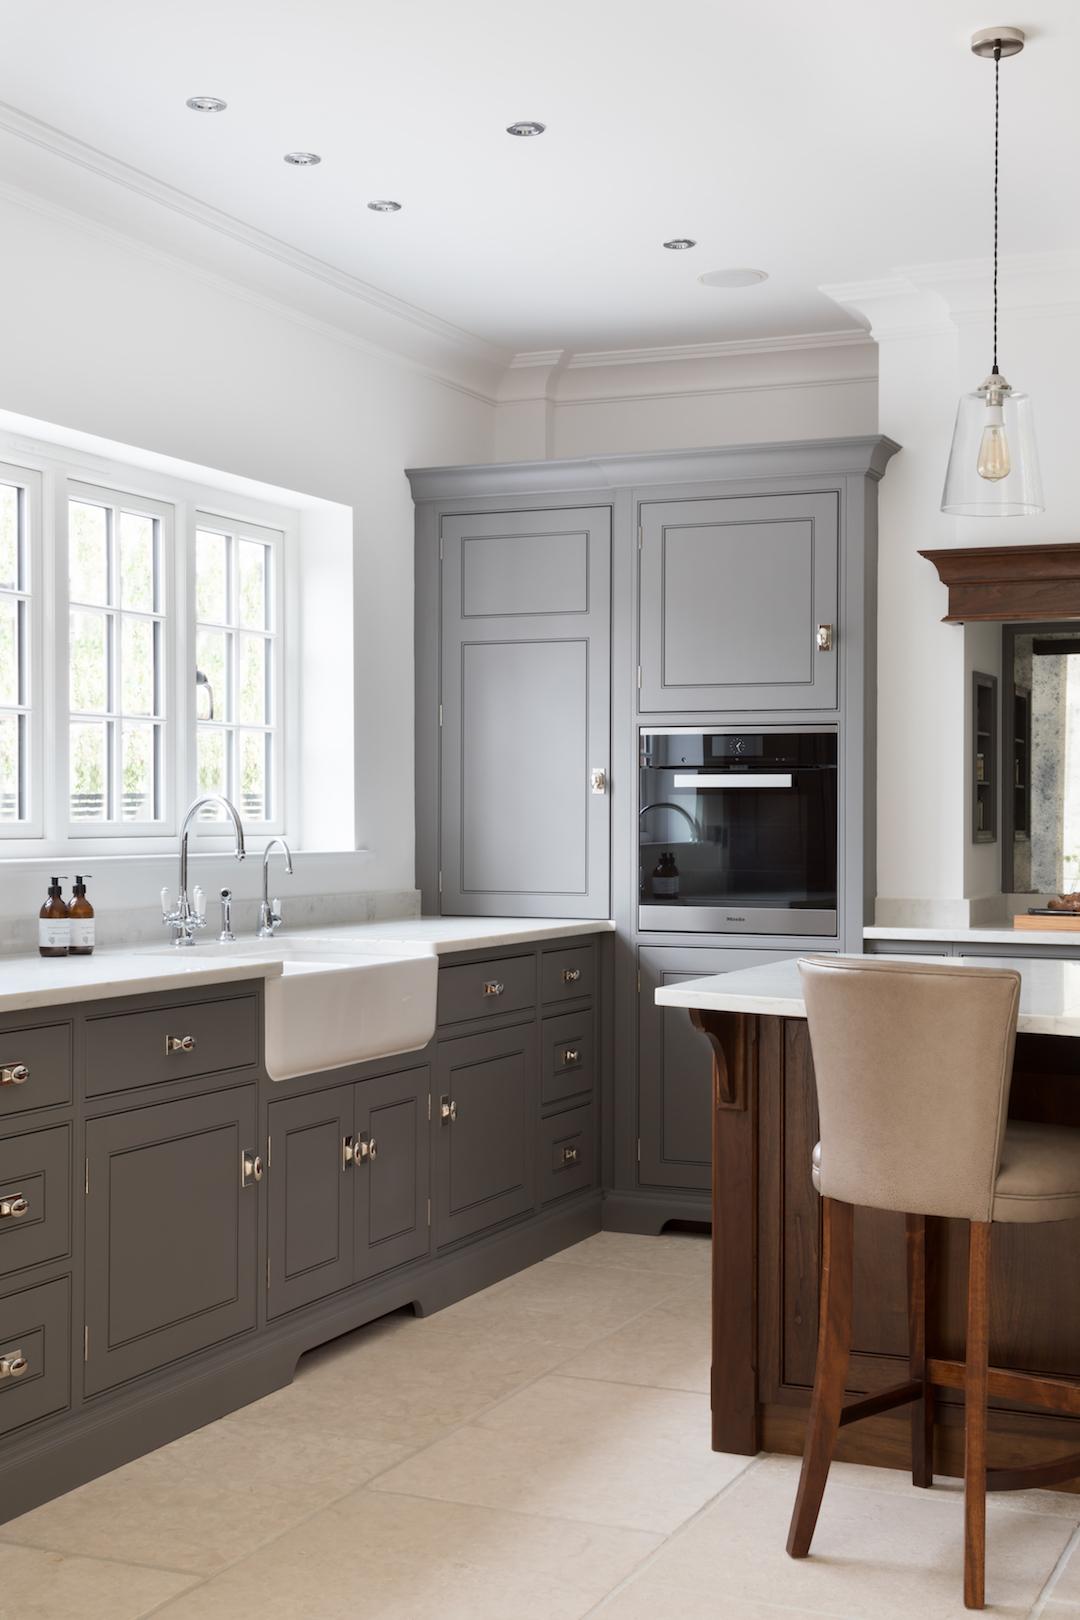 Orchard-House-Luxury-Family-Kitchen-Essex-Humphrey-Munson-14.jpg